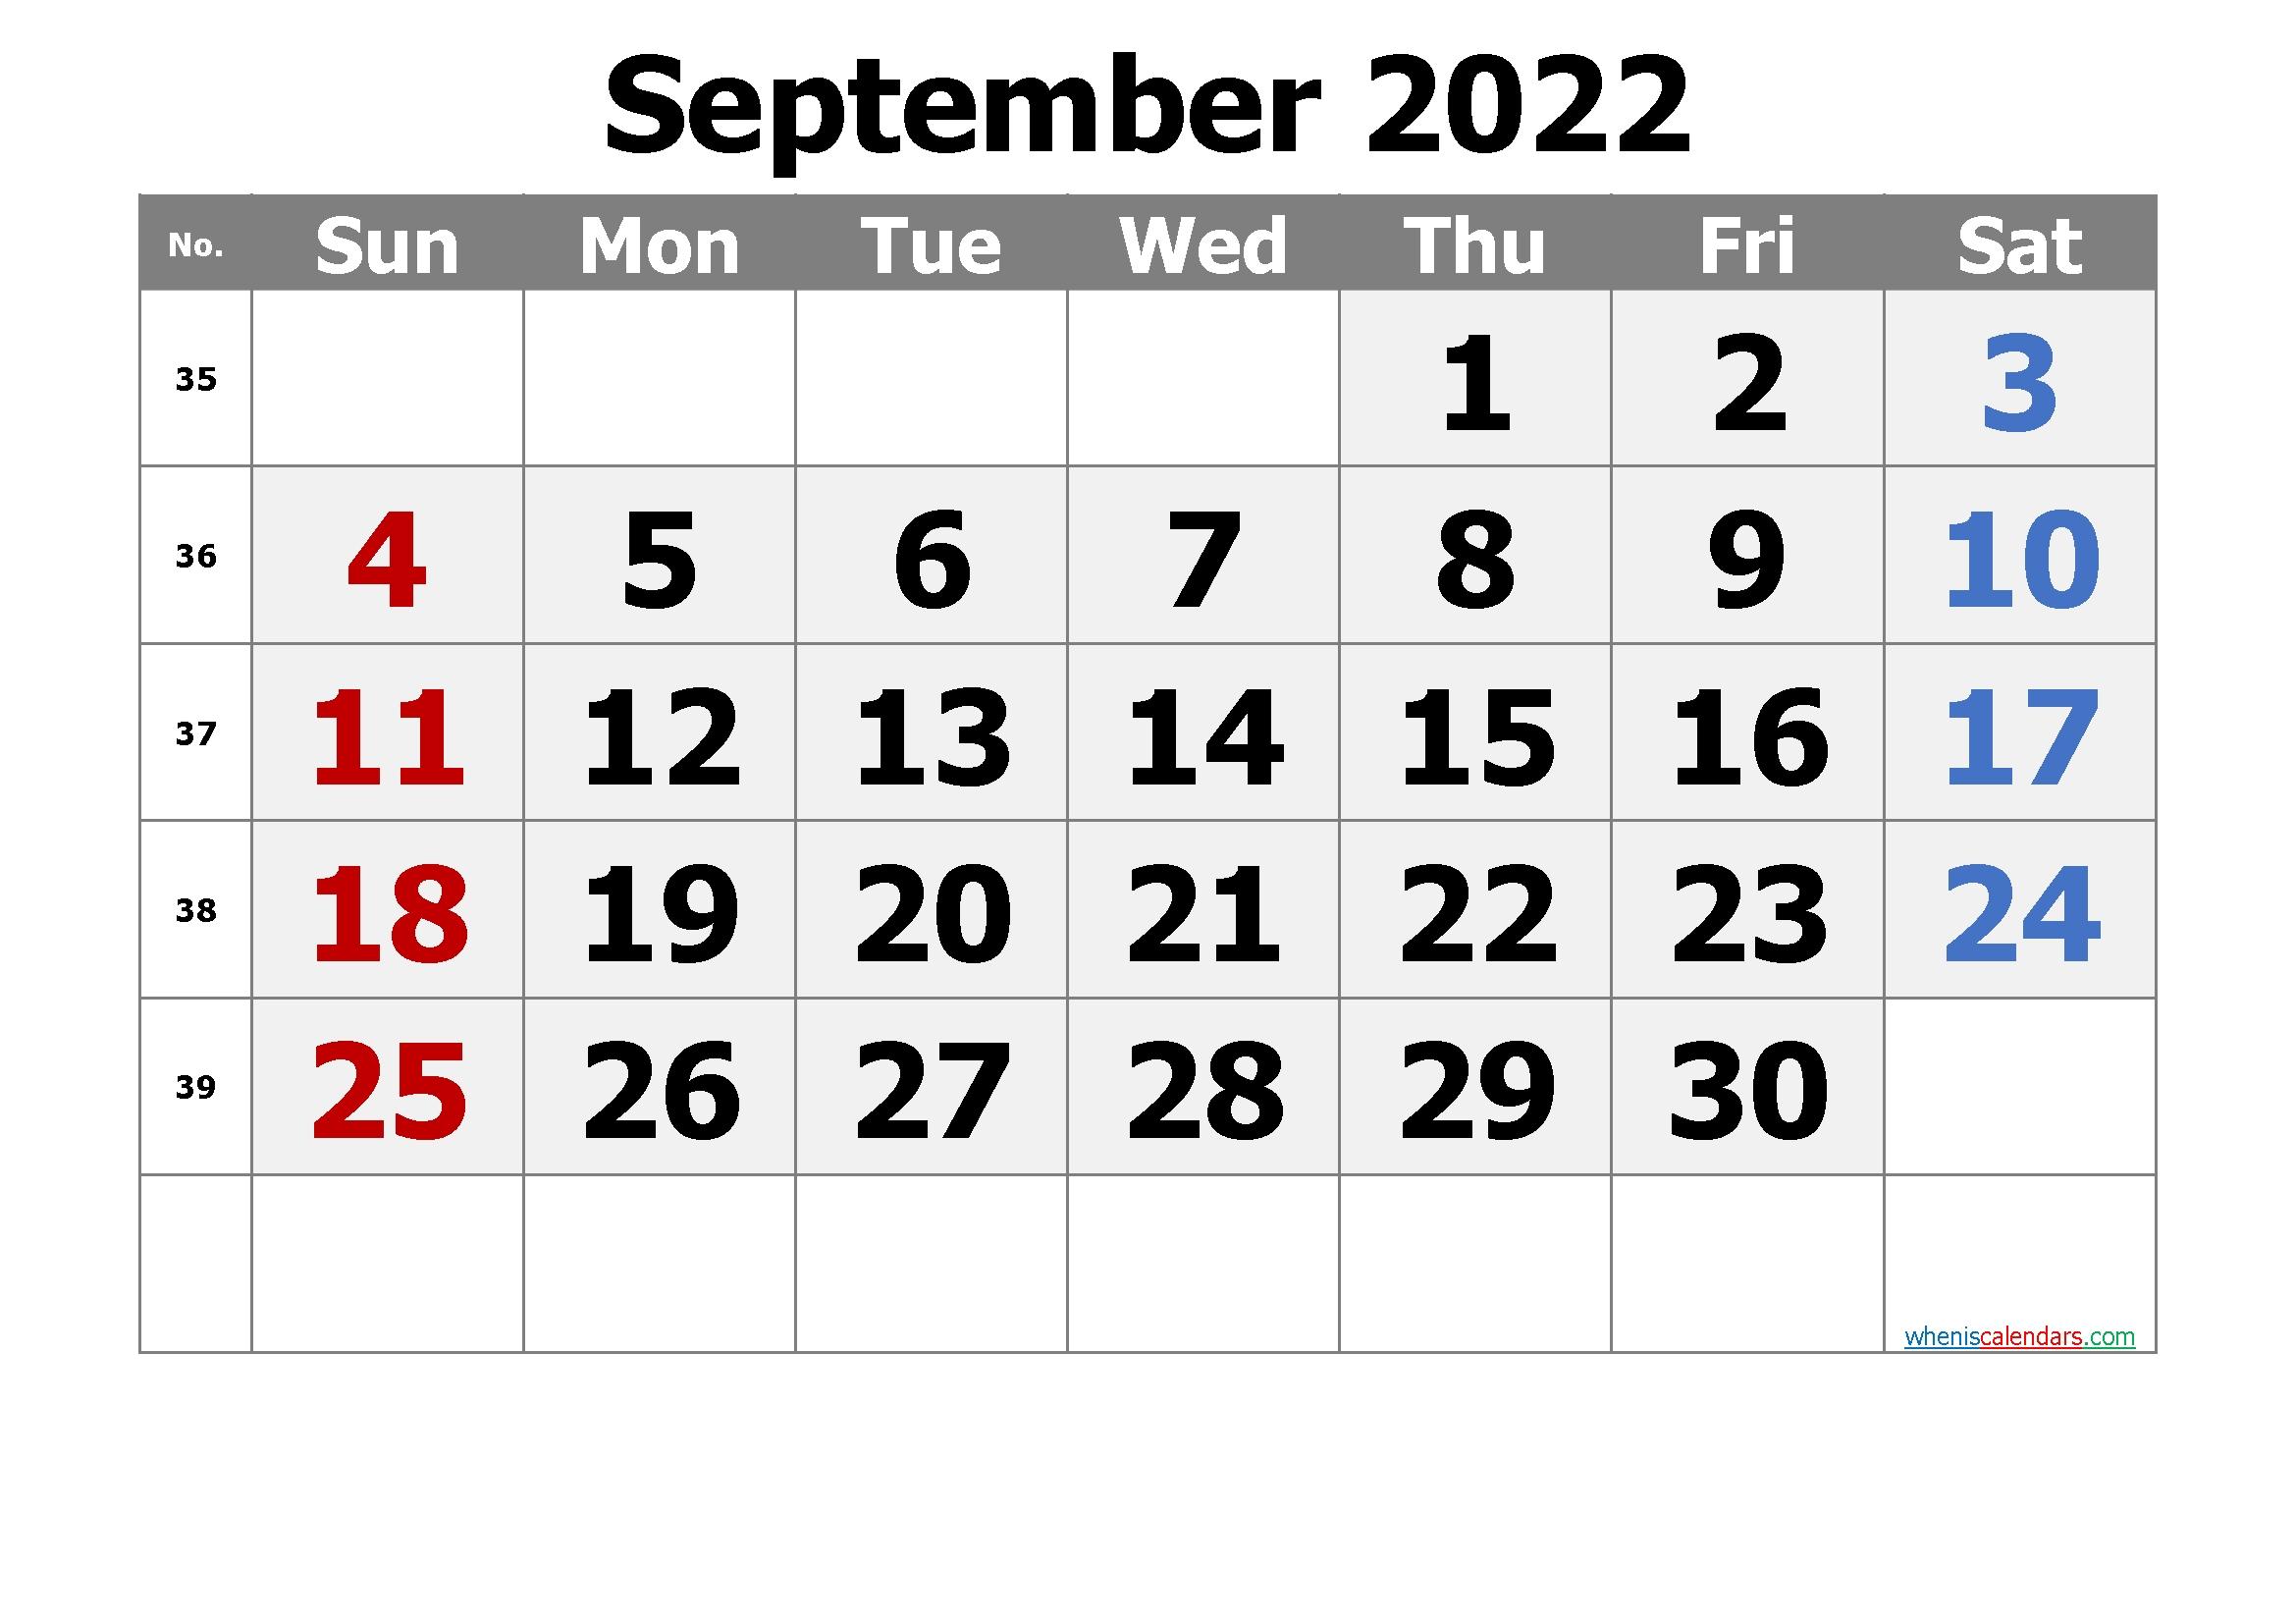 free printable calendar september 2022::September 2022 Cute Calendar Free